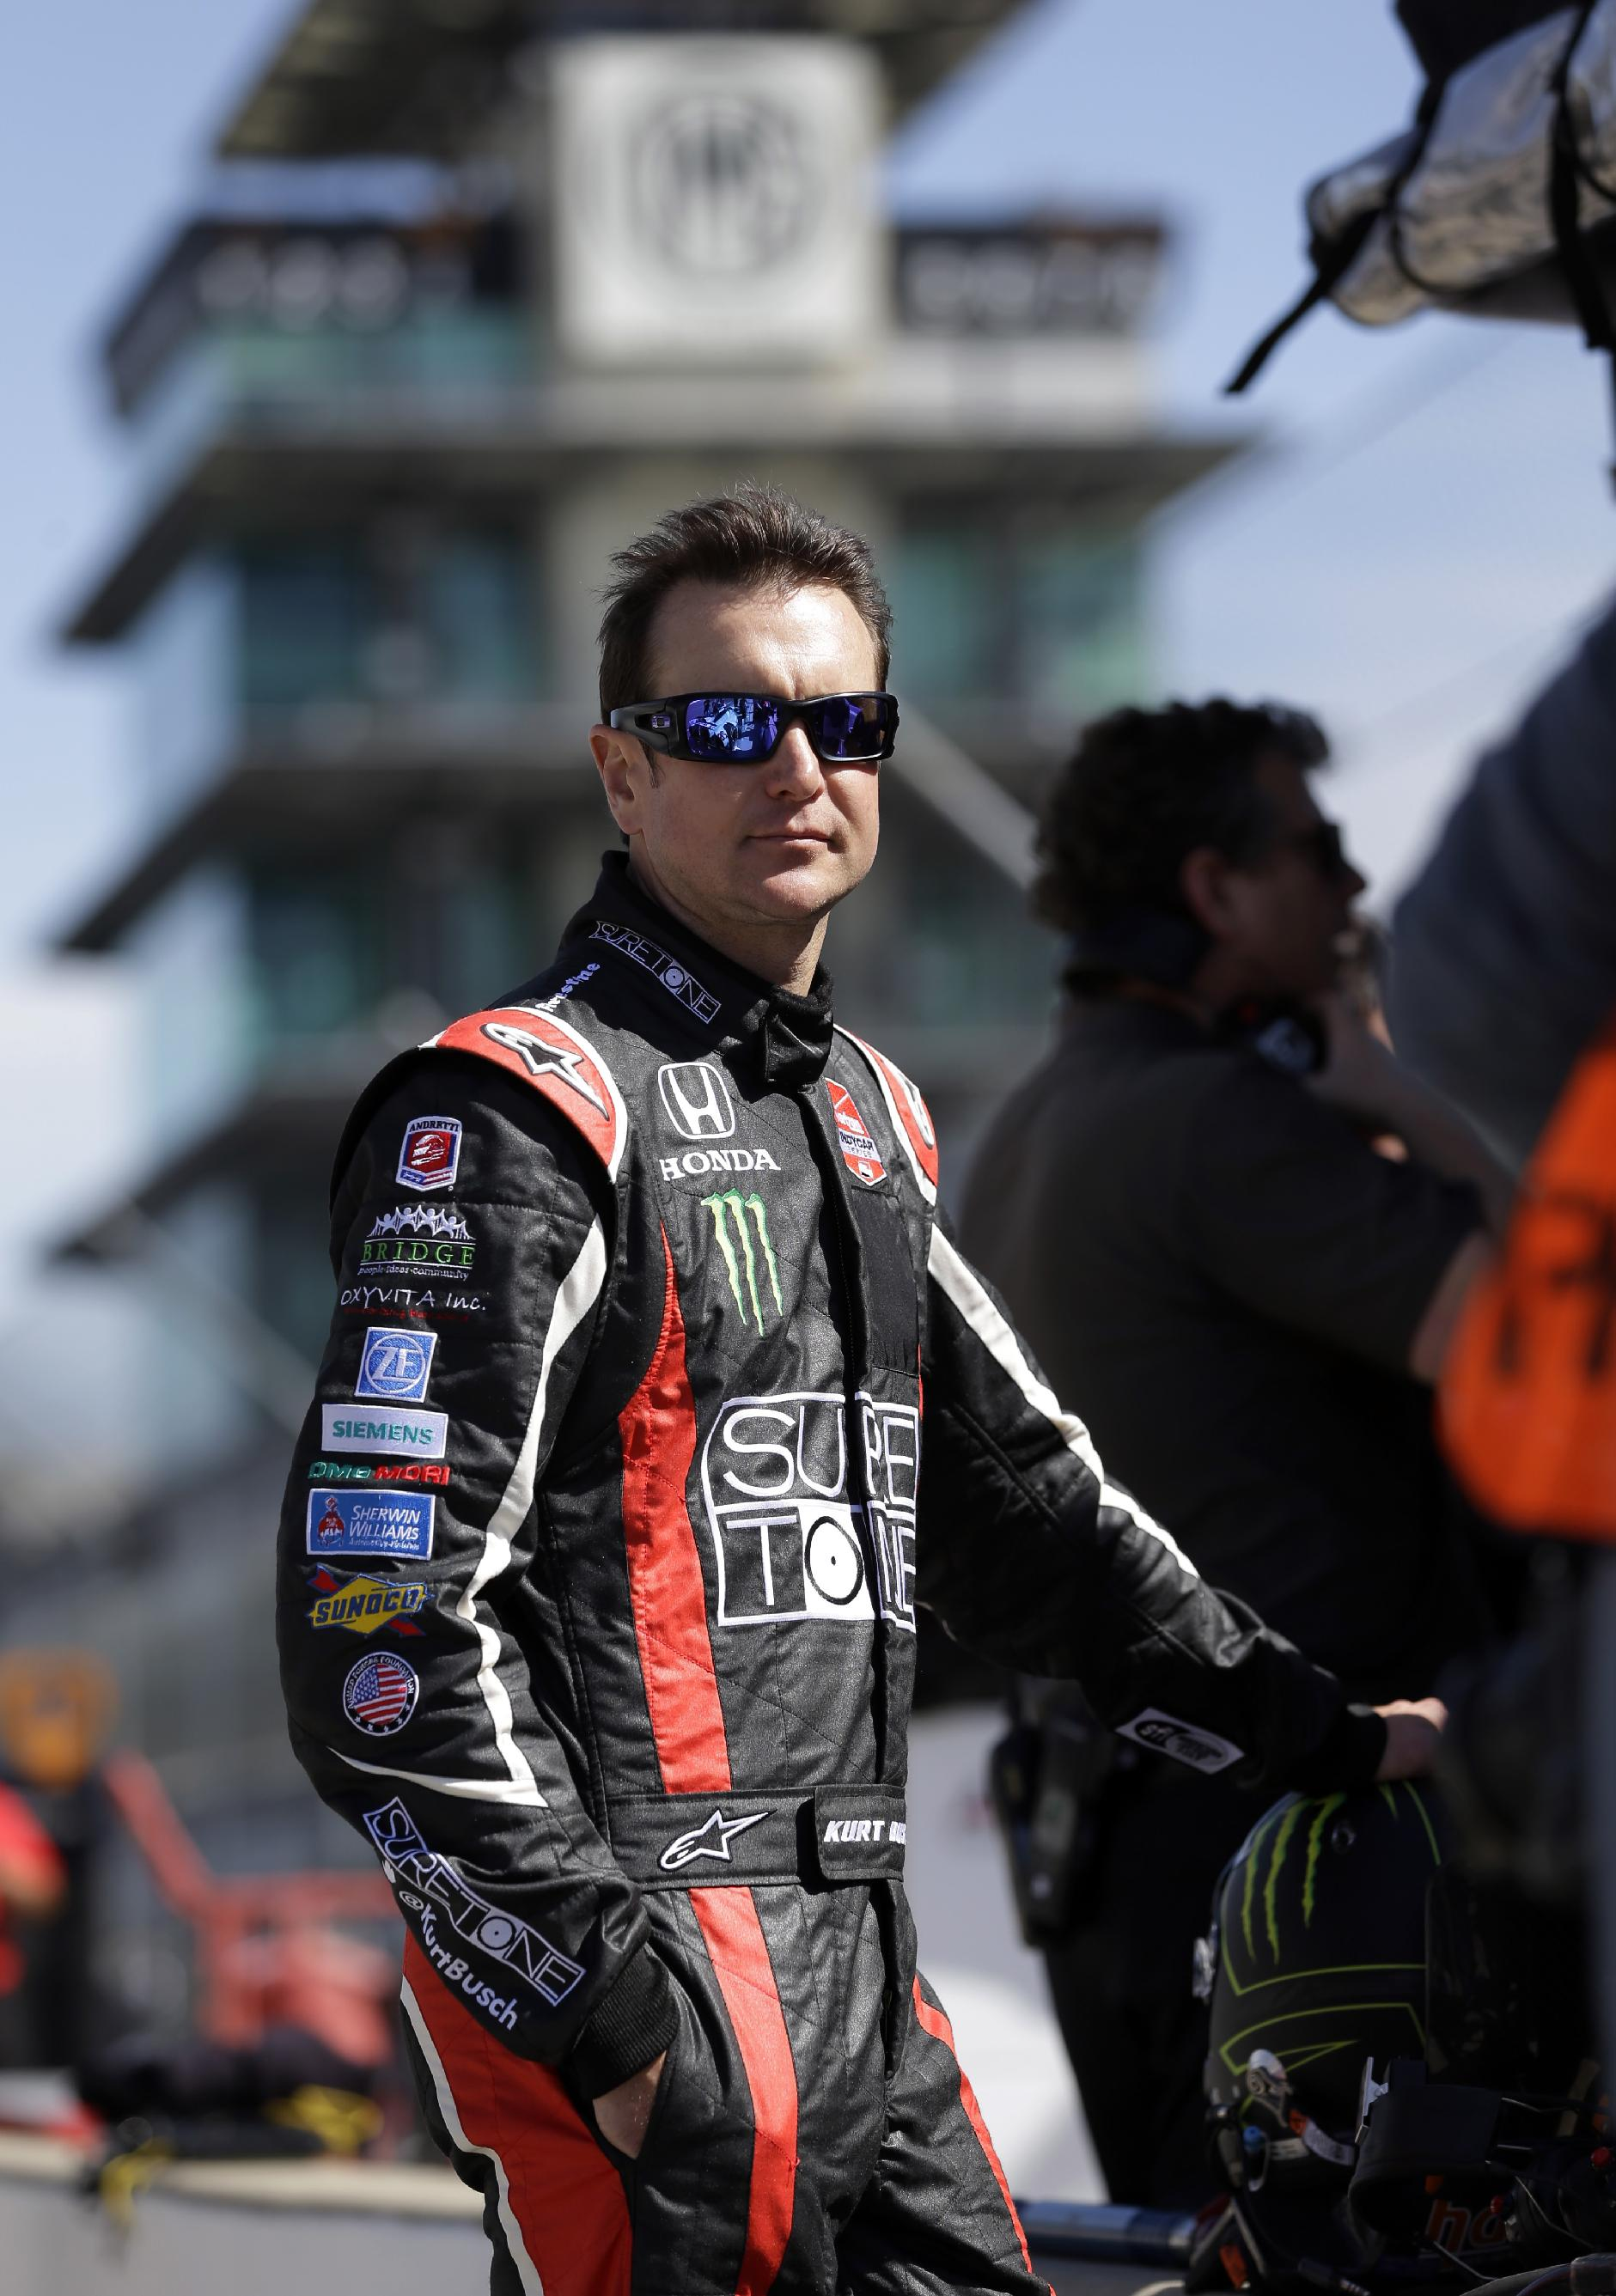 Kurt Busch getting comfortable in IndyCar testing